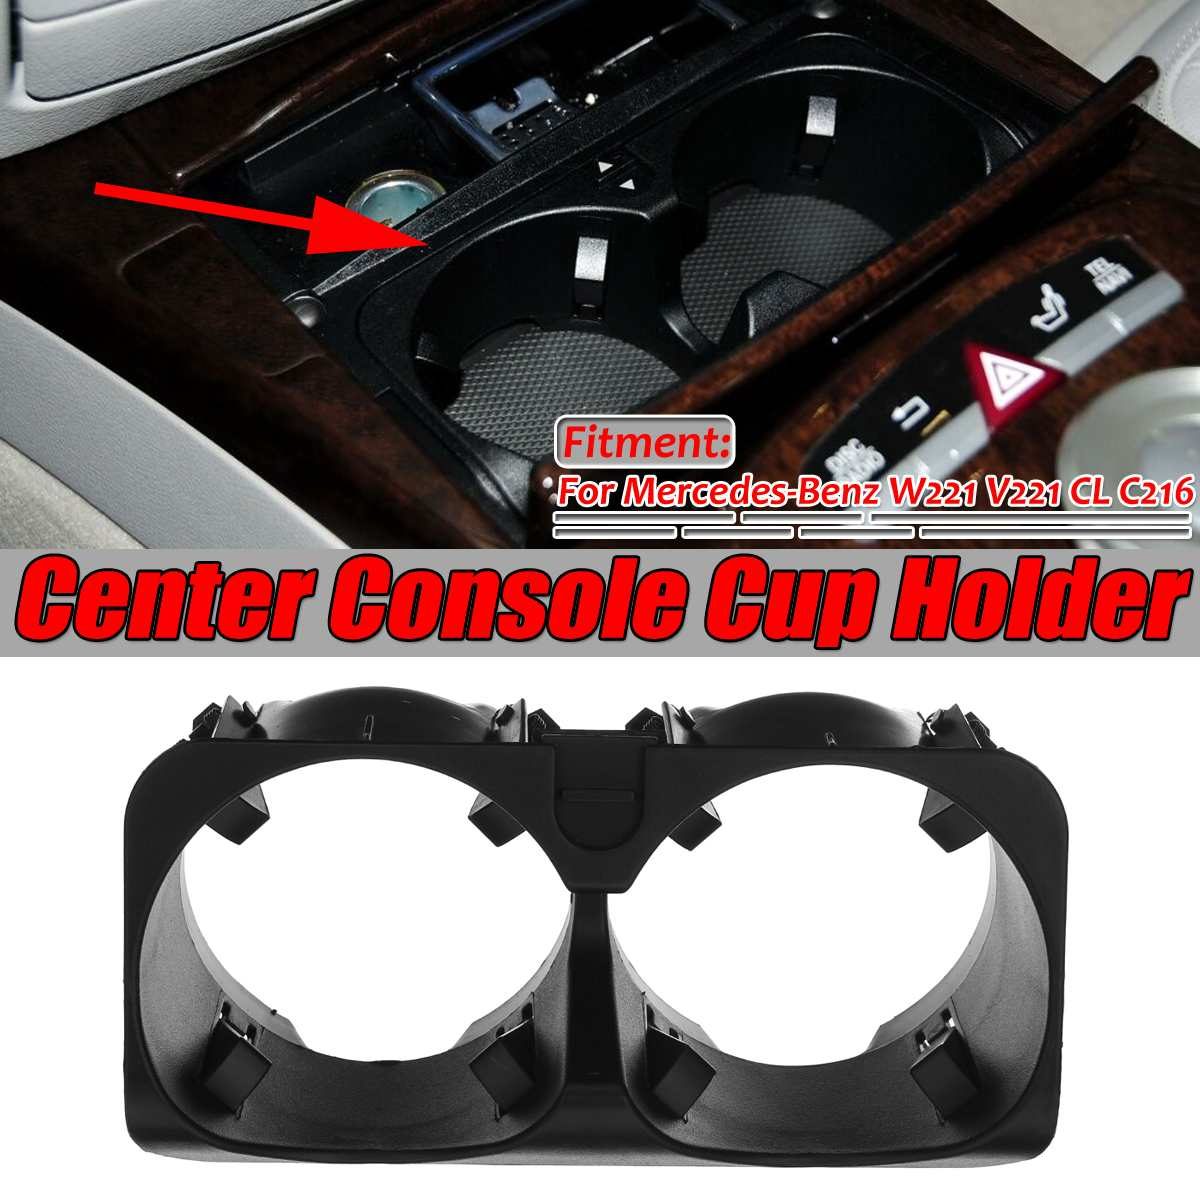 Nuevo soporte de copa para consola central de coche W221 soporte para bebida cubierta exterior para Mercedes ForBenz s-class W221 V221 CL C216 A2218130014